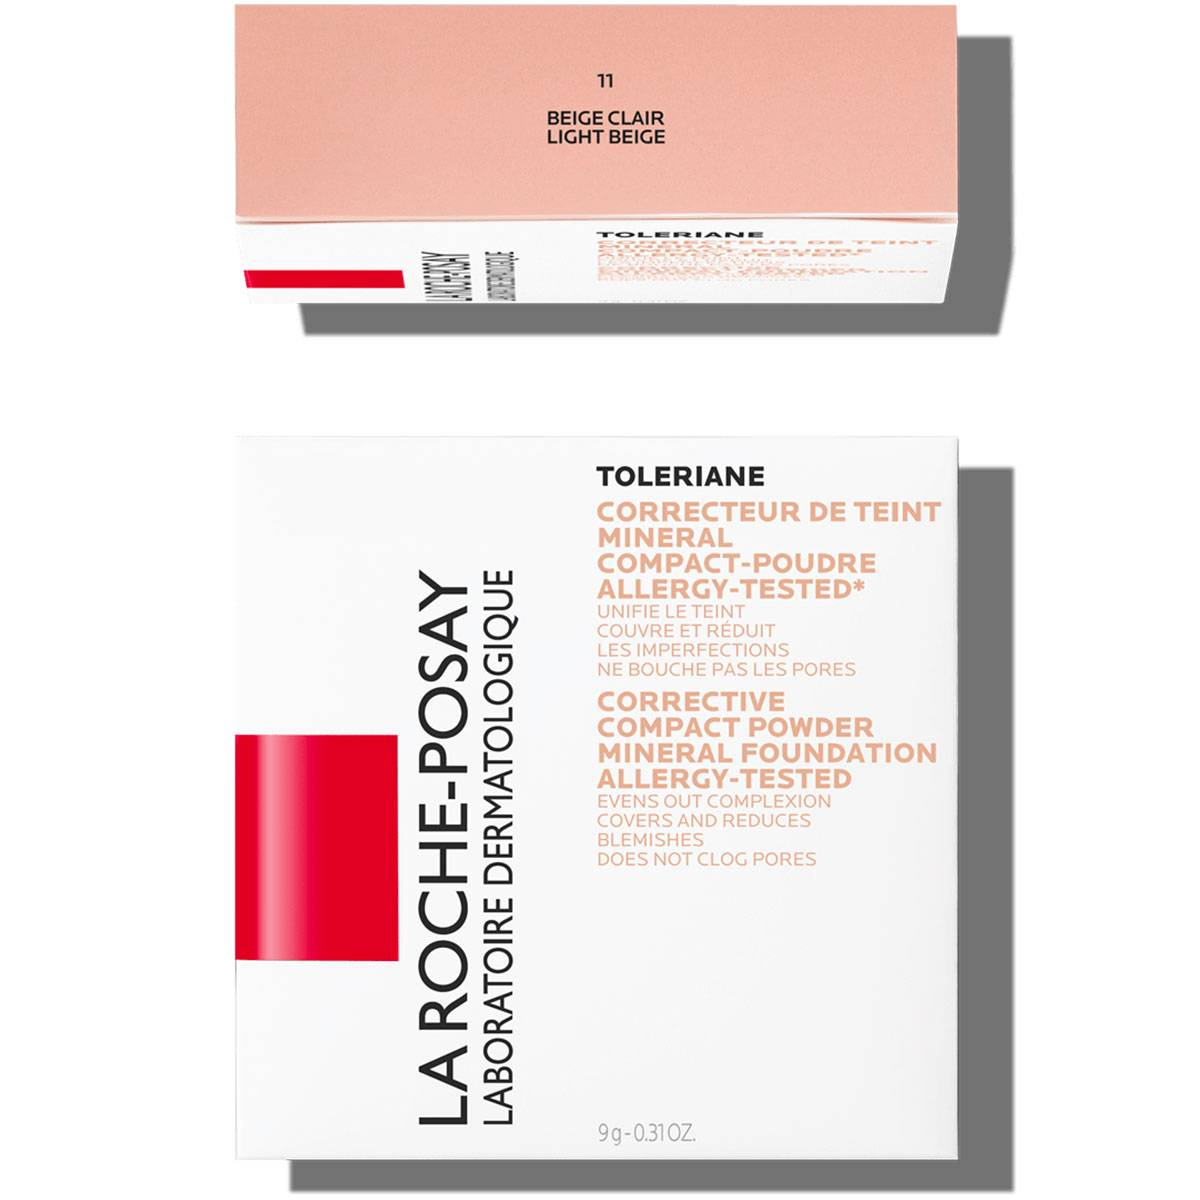 La Roche Posay Herkkä Toleriane Make up COMPACT POWDER 11LightBeige